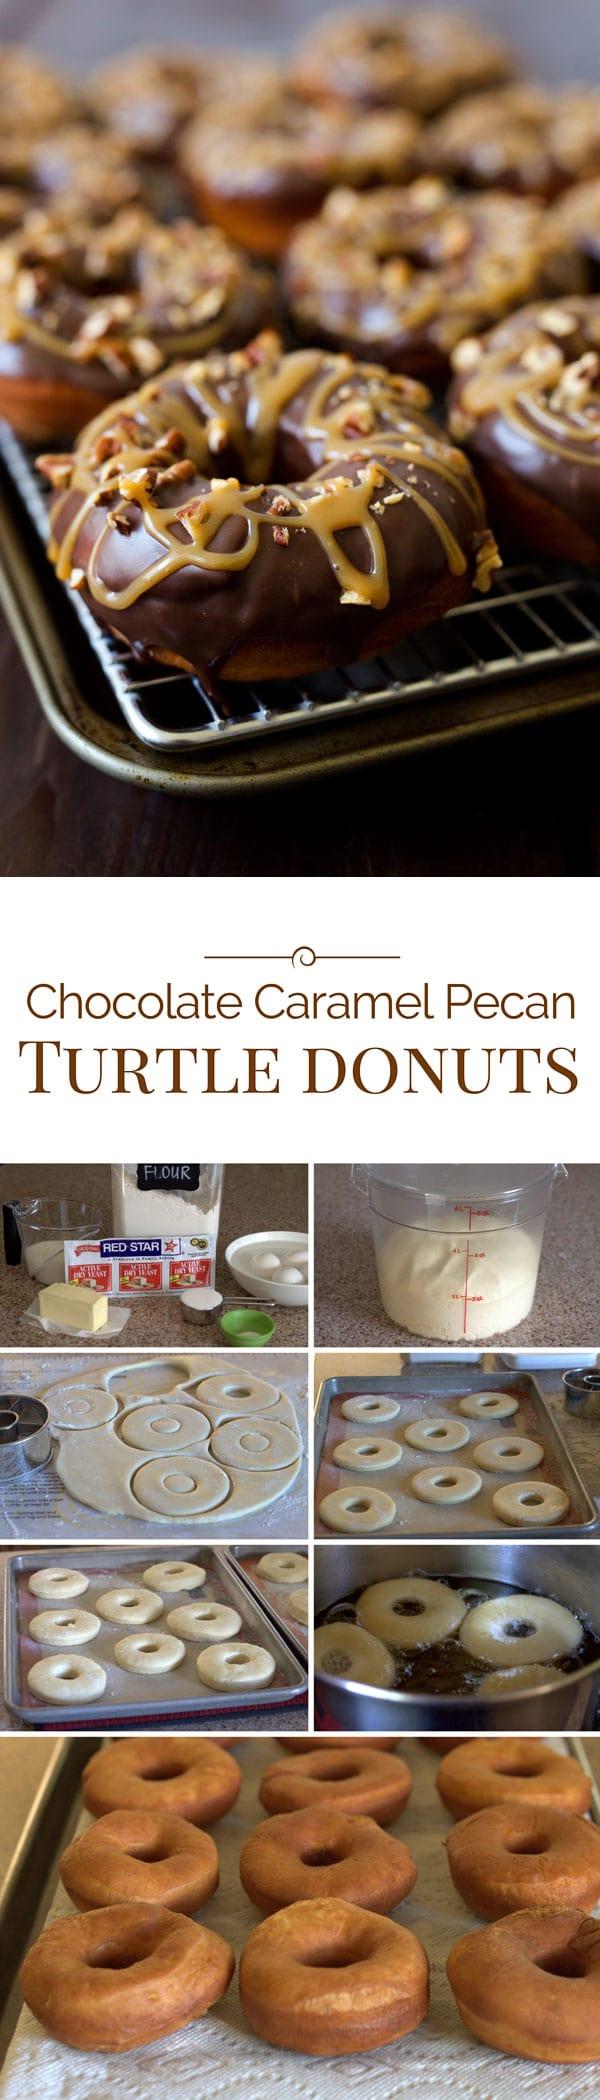 Chocolate-Caramel-Pecan-Doughnuts-Collage-Barbara-Bakes